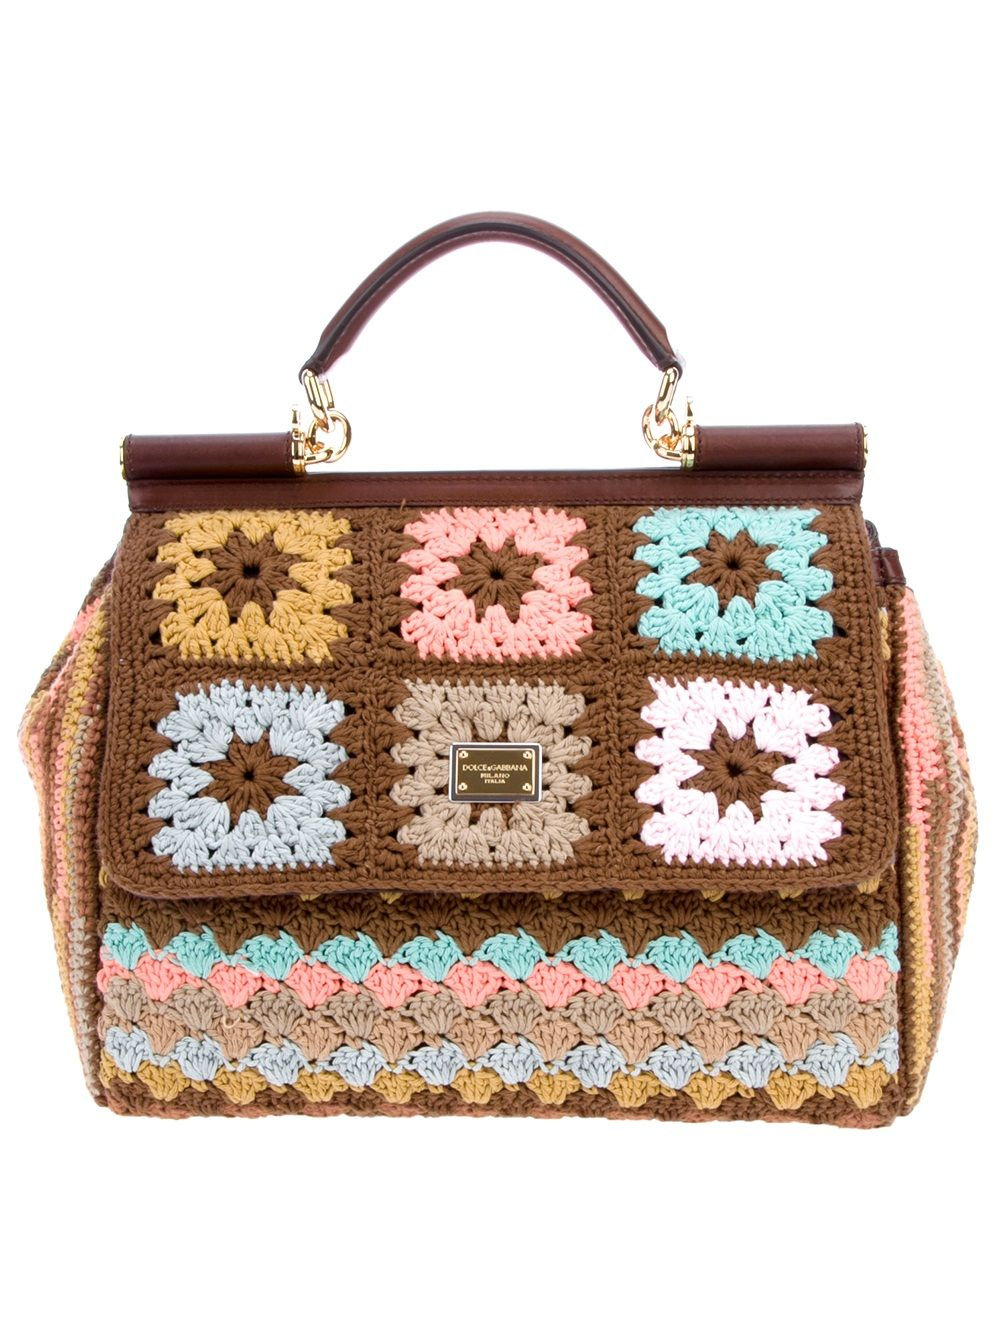 Dolce   Gabbana Crochet Shoulder Bag Brown cotton and leather crochet  shoulder bag from Dolce   Cabbana featuring a multicolor multi-patterned  crocheted ... d0b0b00af1